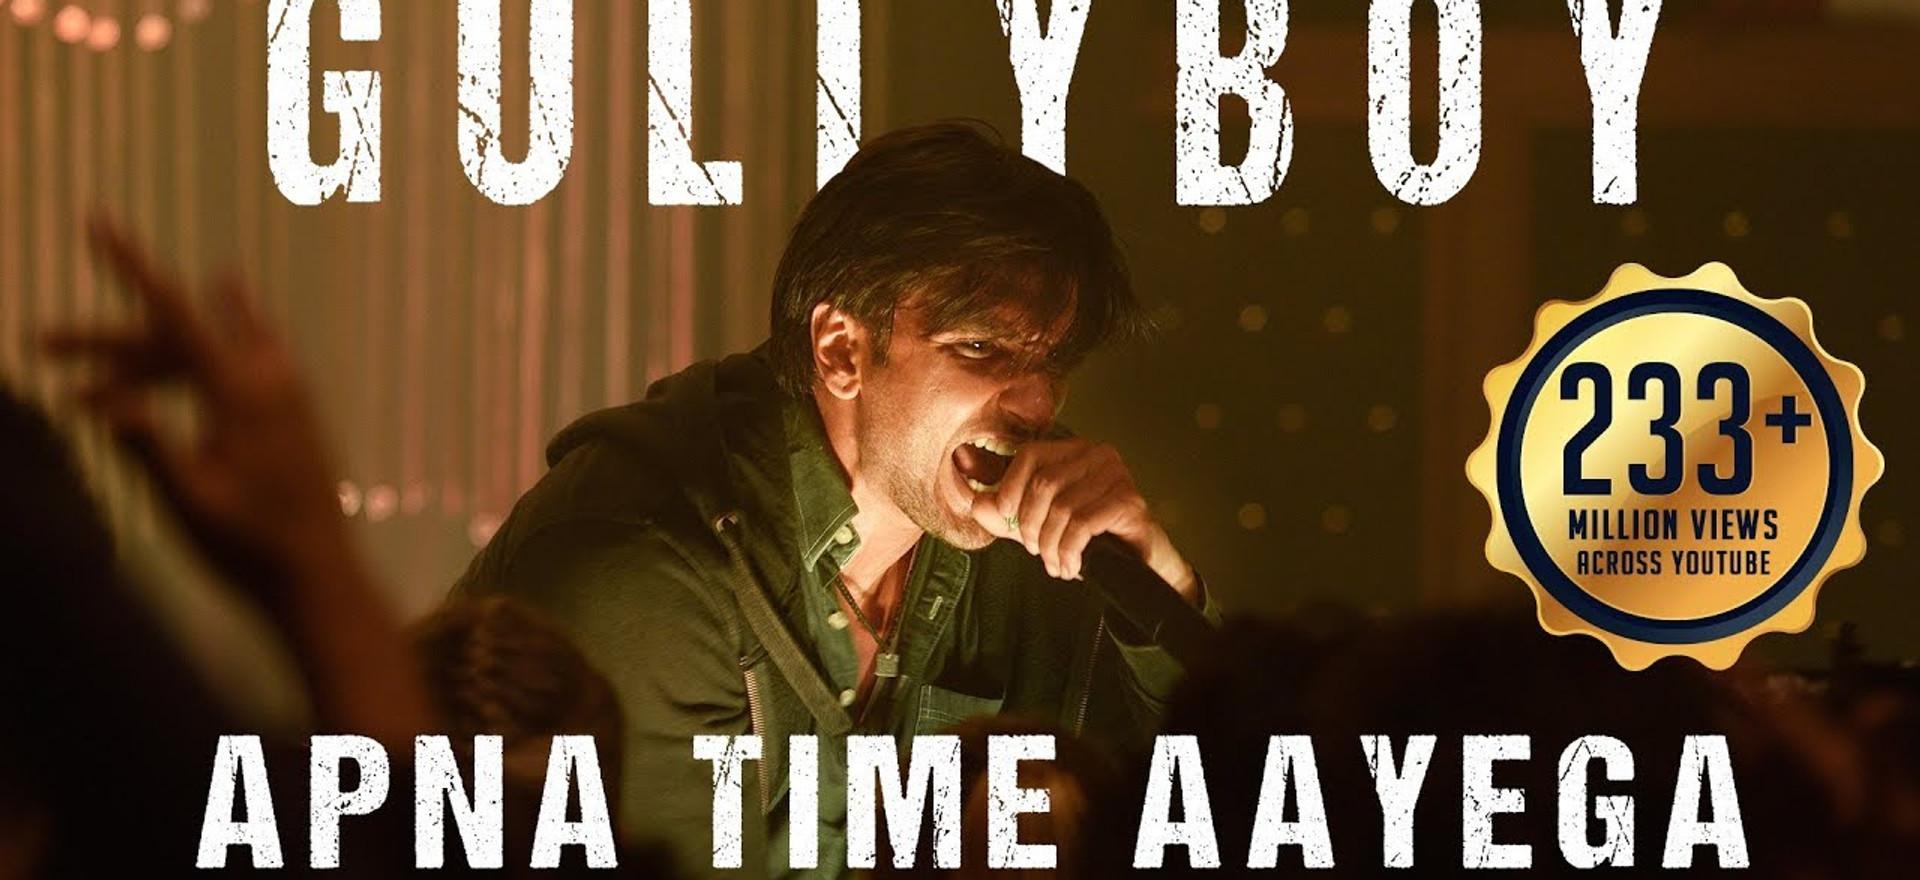 Apna Time Aayega | Gully Boy | Ranveer Singh & Alia Bhatt | DIVINE